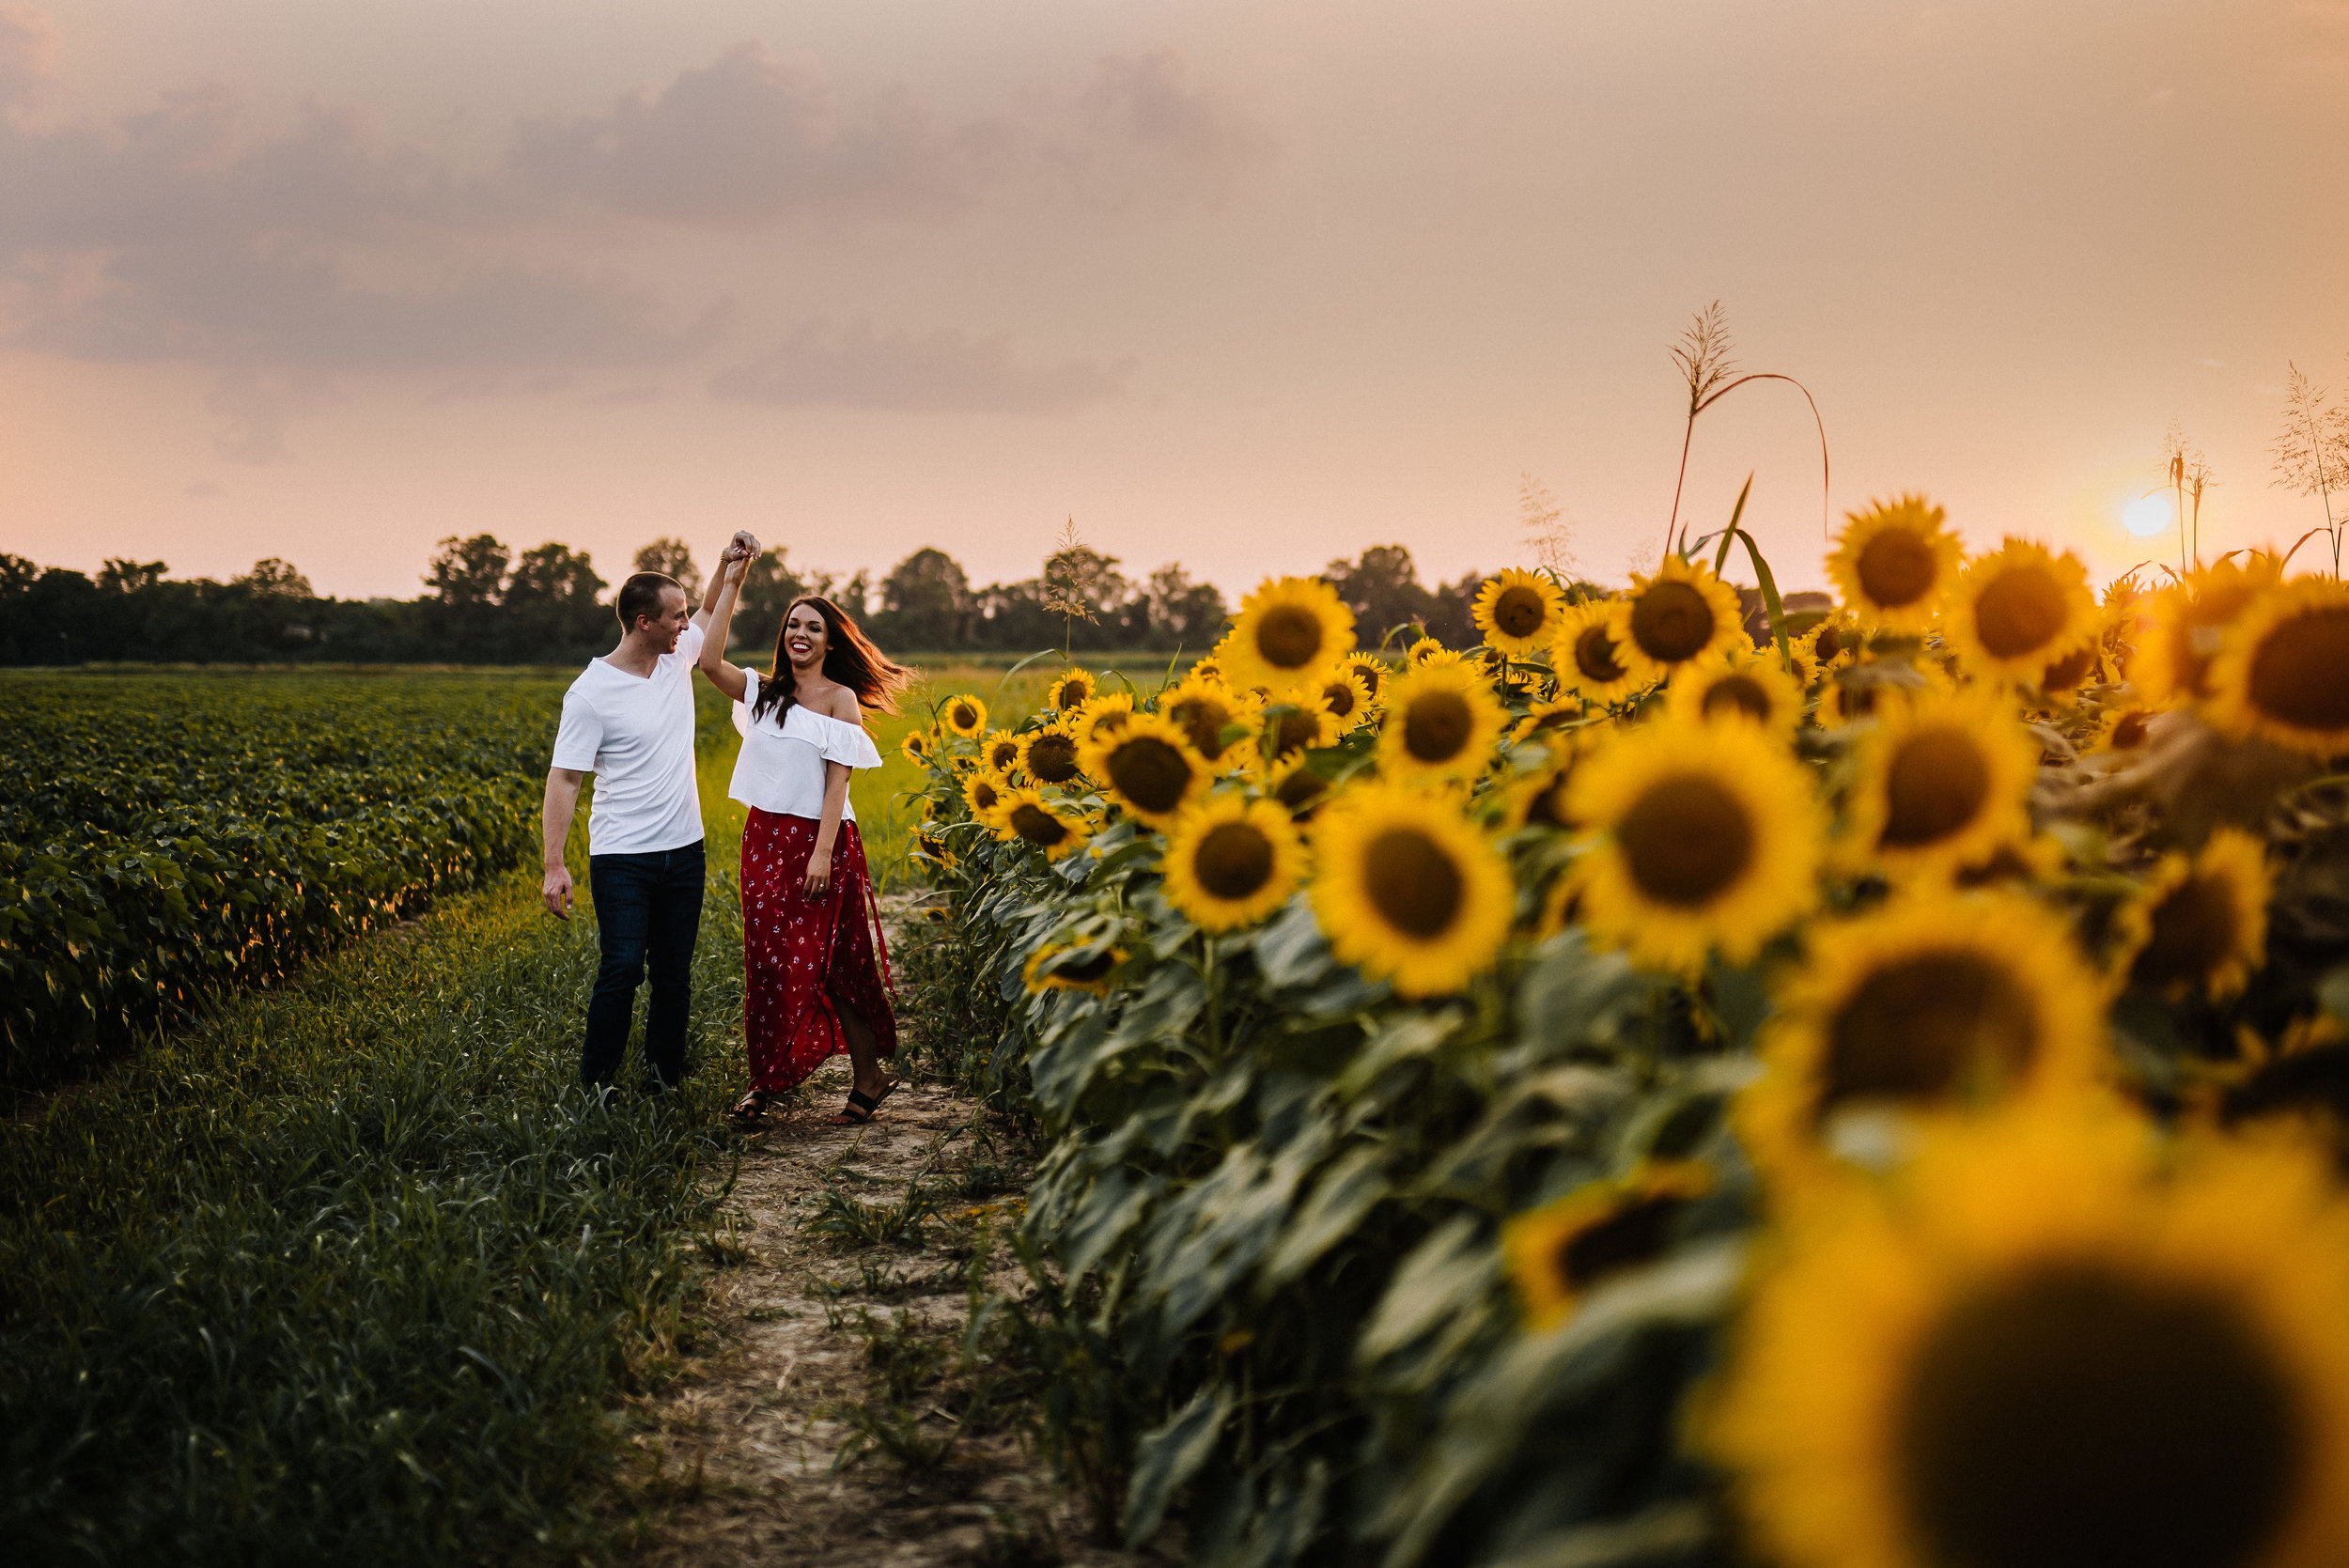 Kaitlynne&Van_Sunflowers_Ashley-Benham-Photography-45.jpg